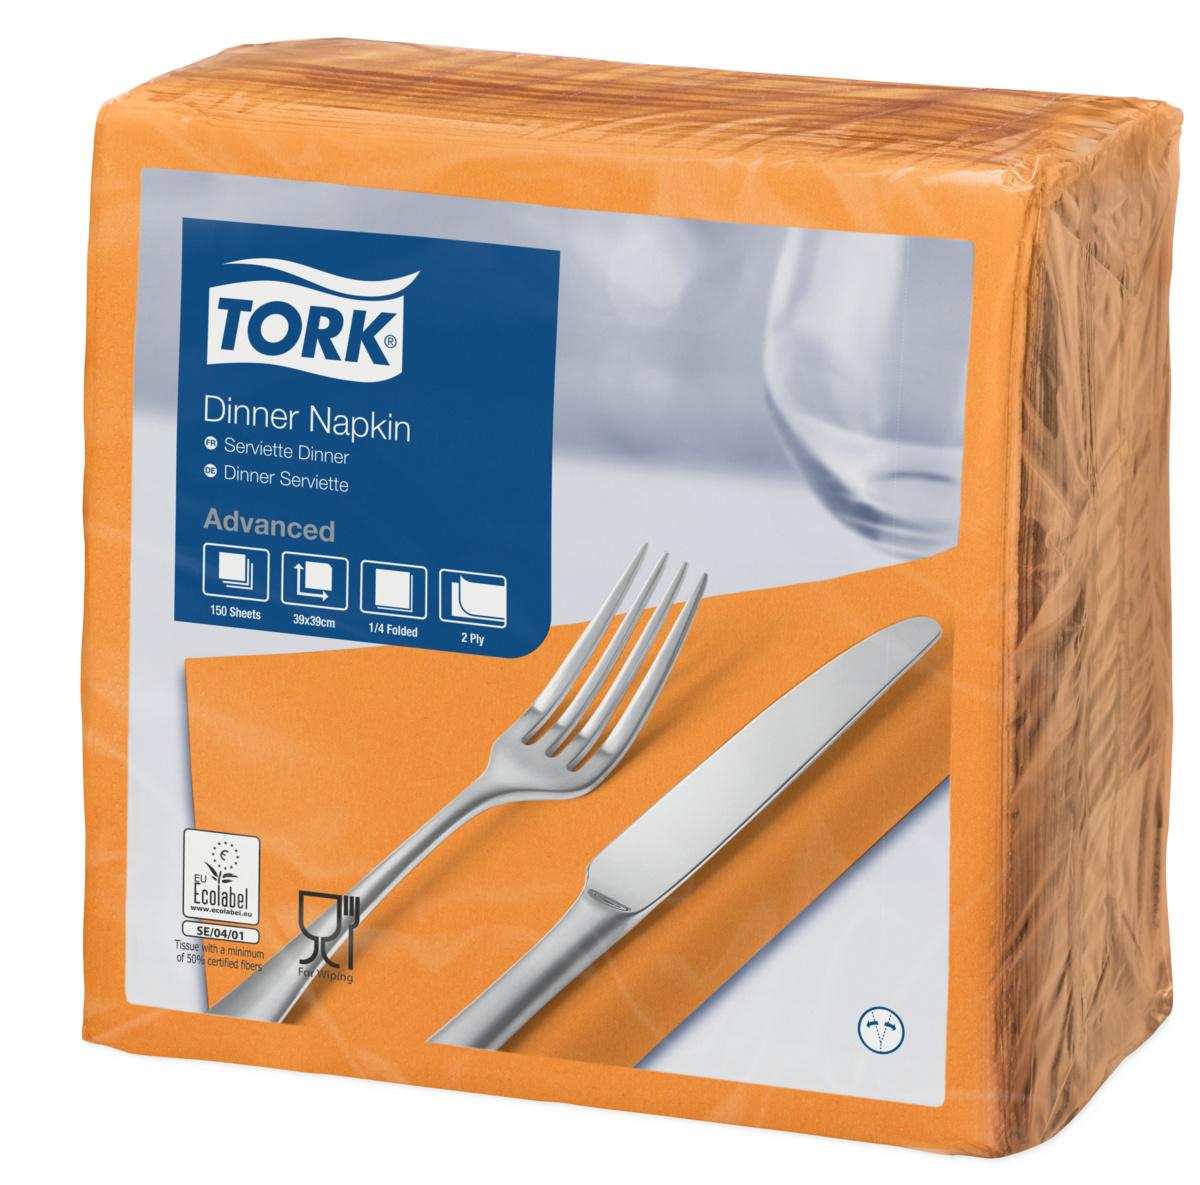 Serviette orange ouate de cellulose 39x39 cm Tork (150 pièces)